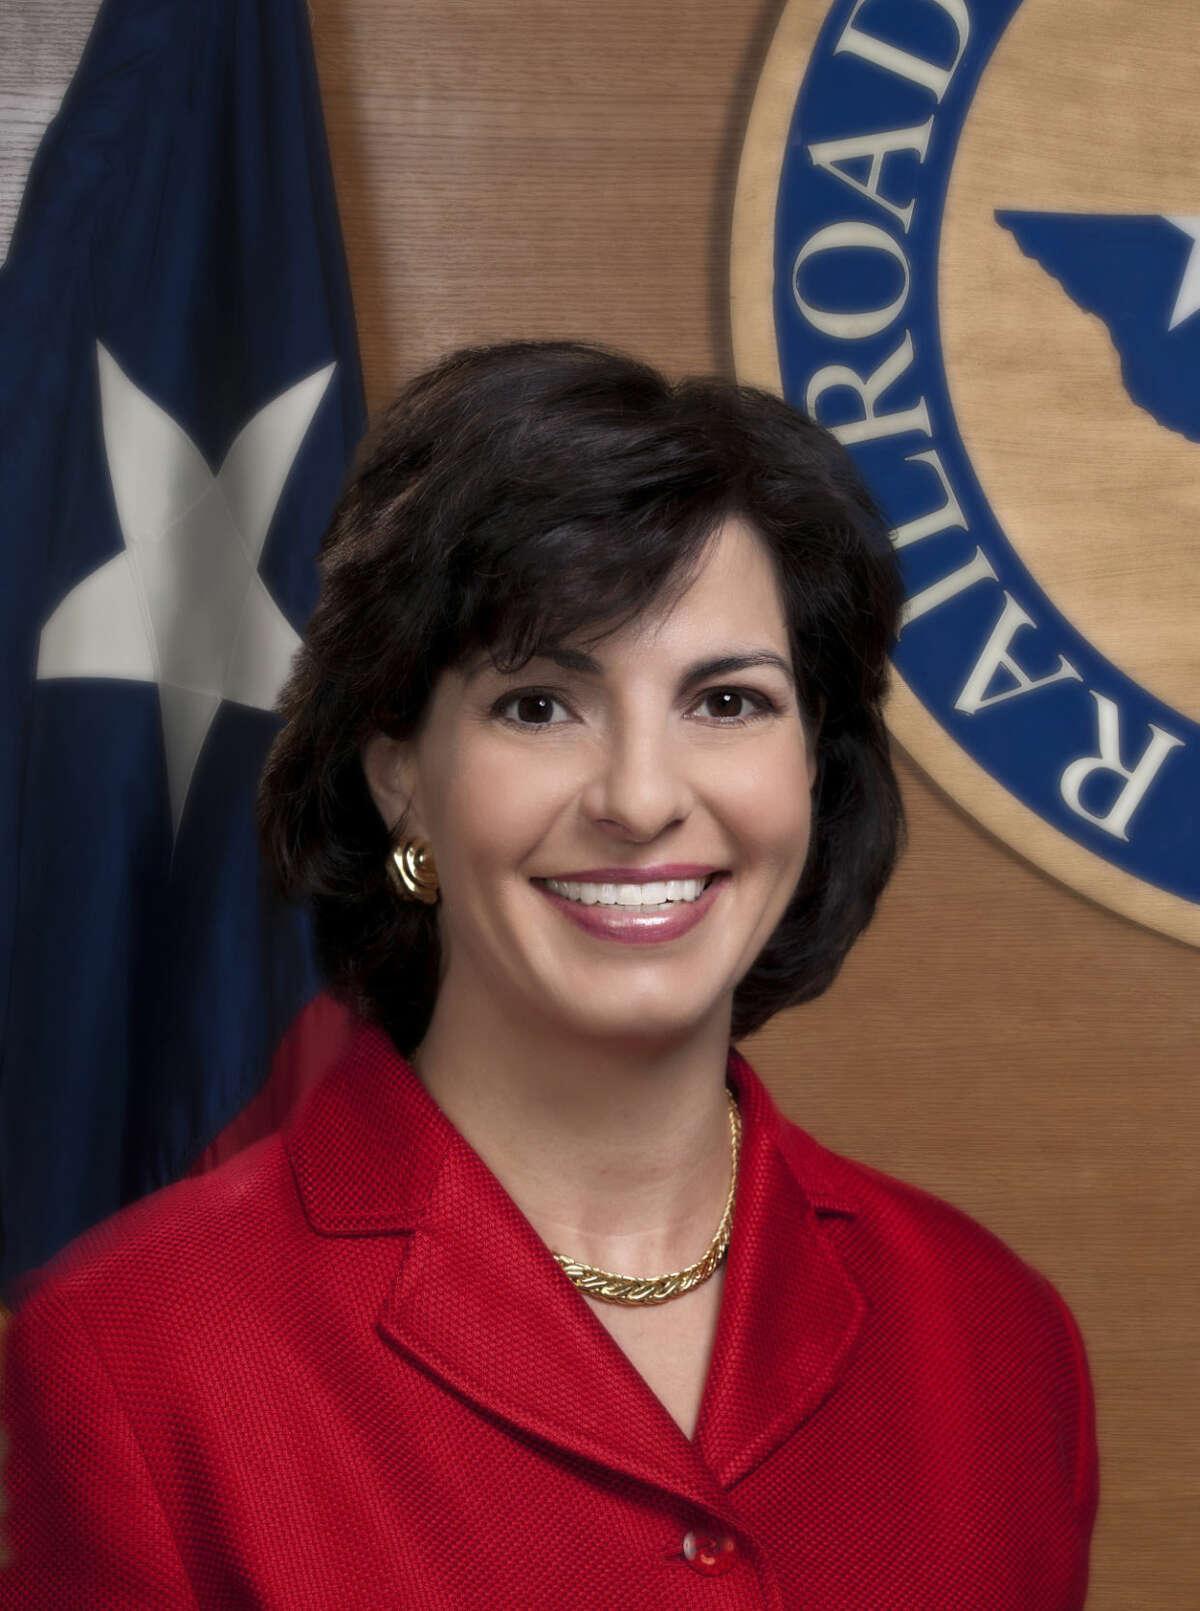 Texas Railroad Commissioner